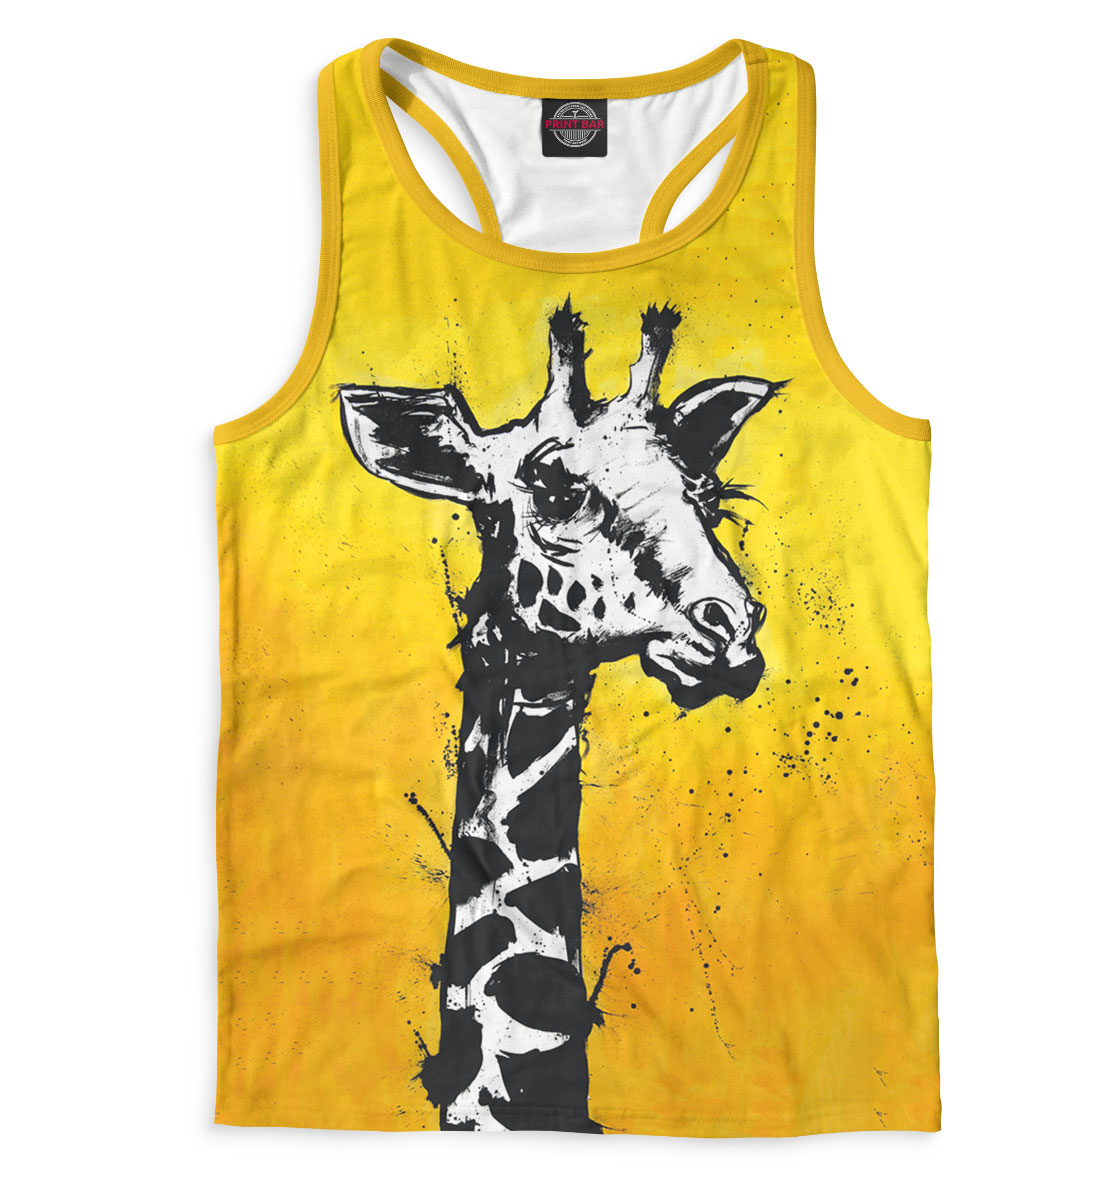 Купить Жираф, арт, Printbar, Майки борцовки, GIR-797138-mayb-2